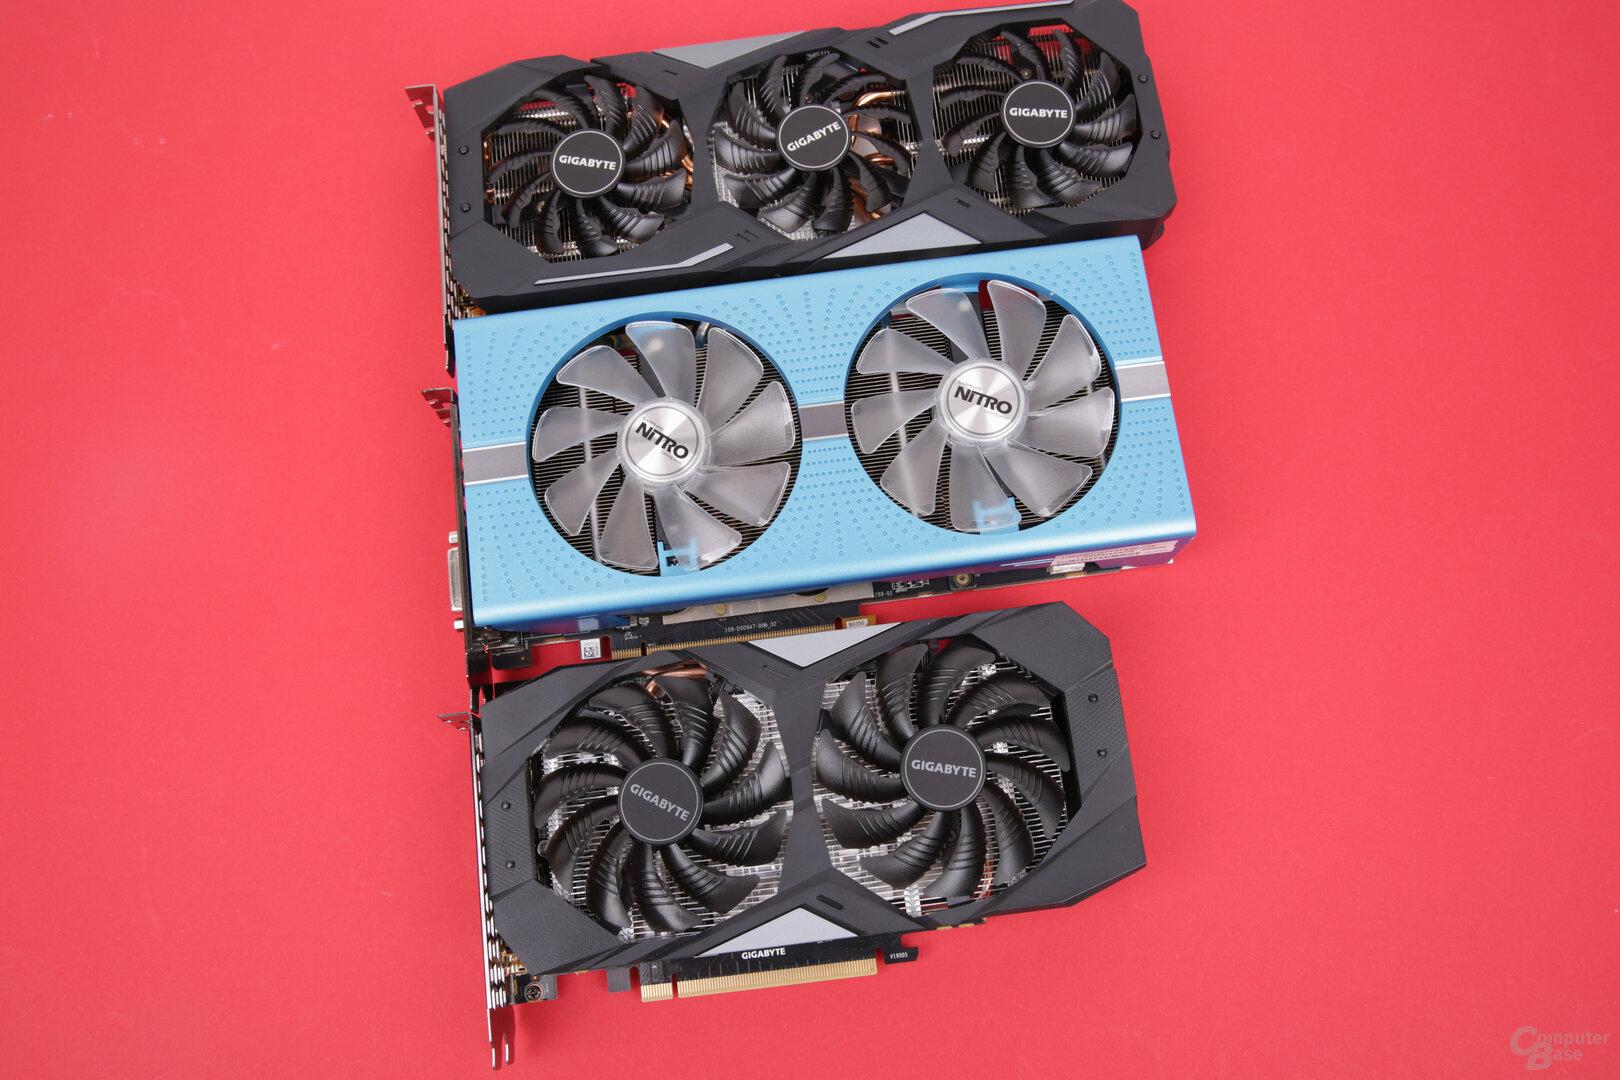 GeForce GTX 1660 vs. Radeon RX 590